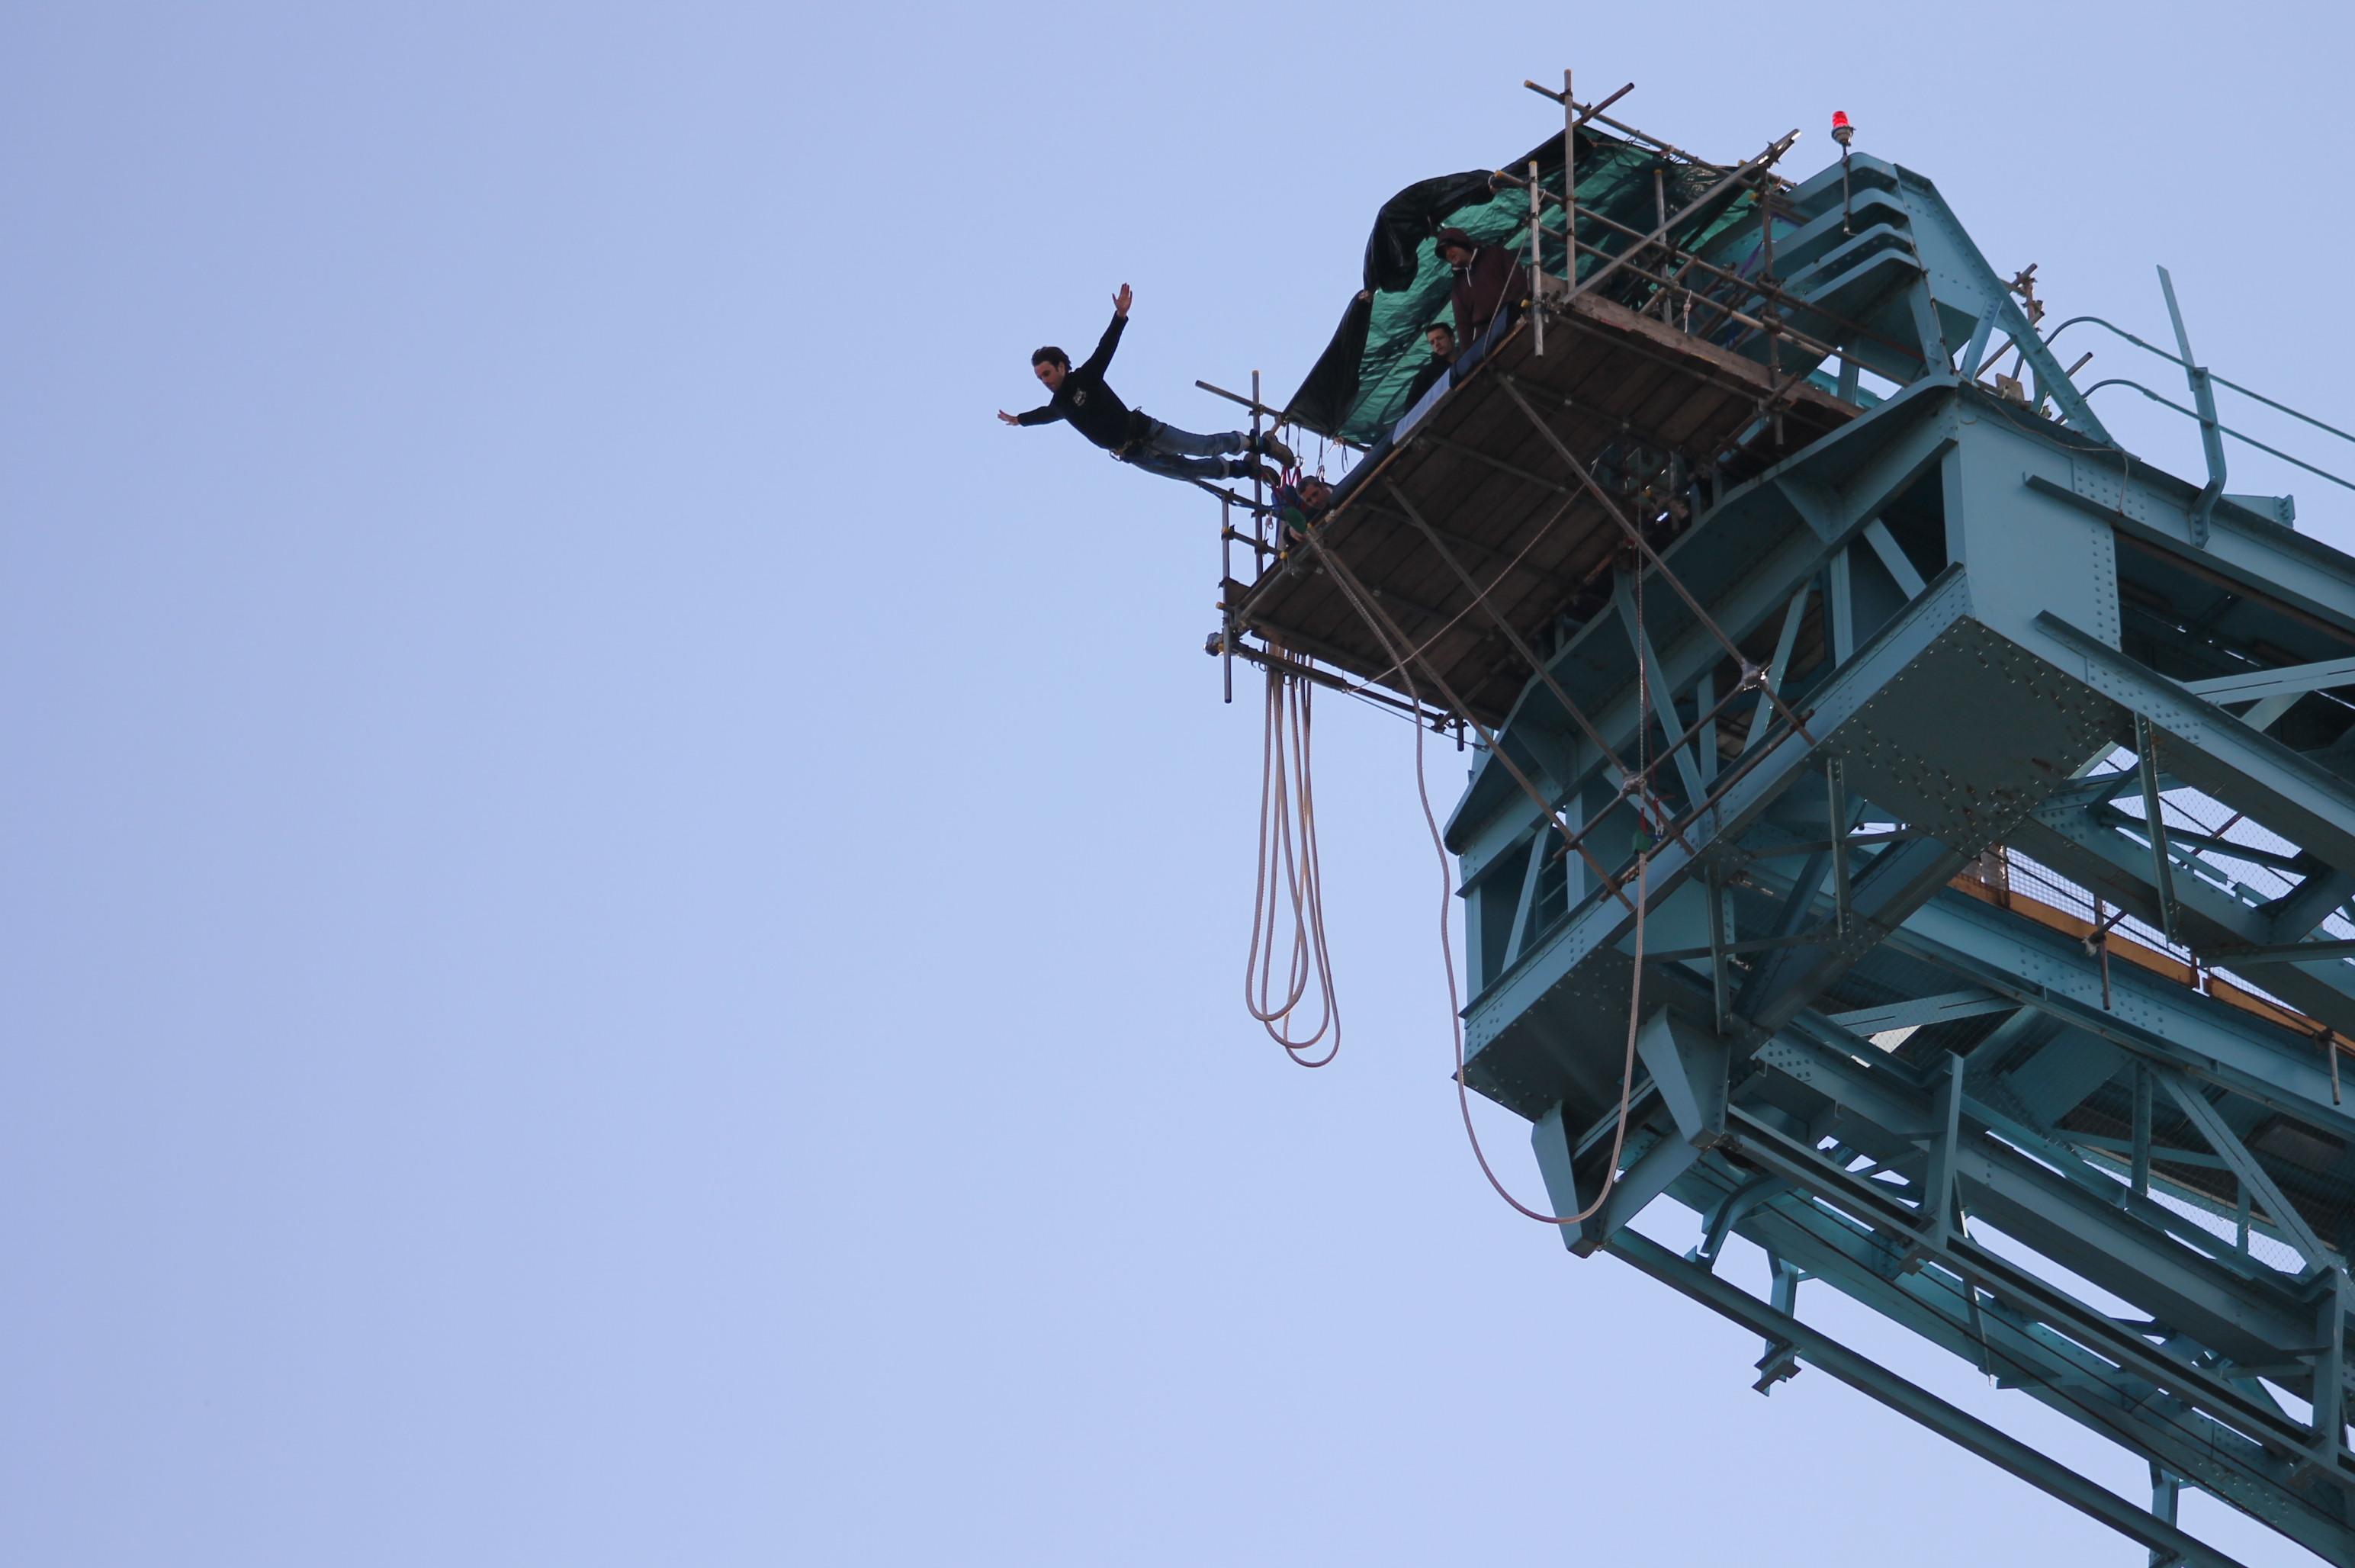 Titan Crane Bungee Jump